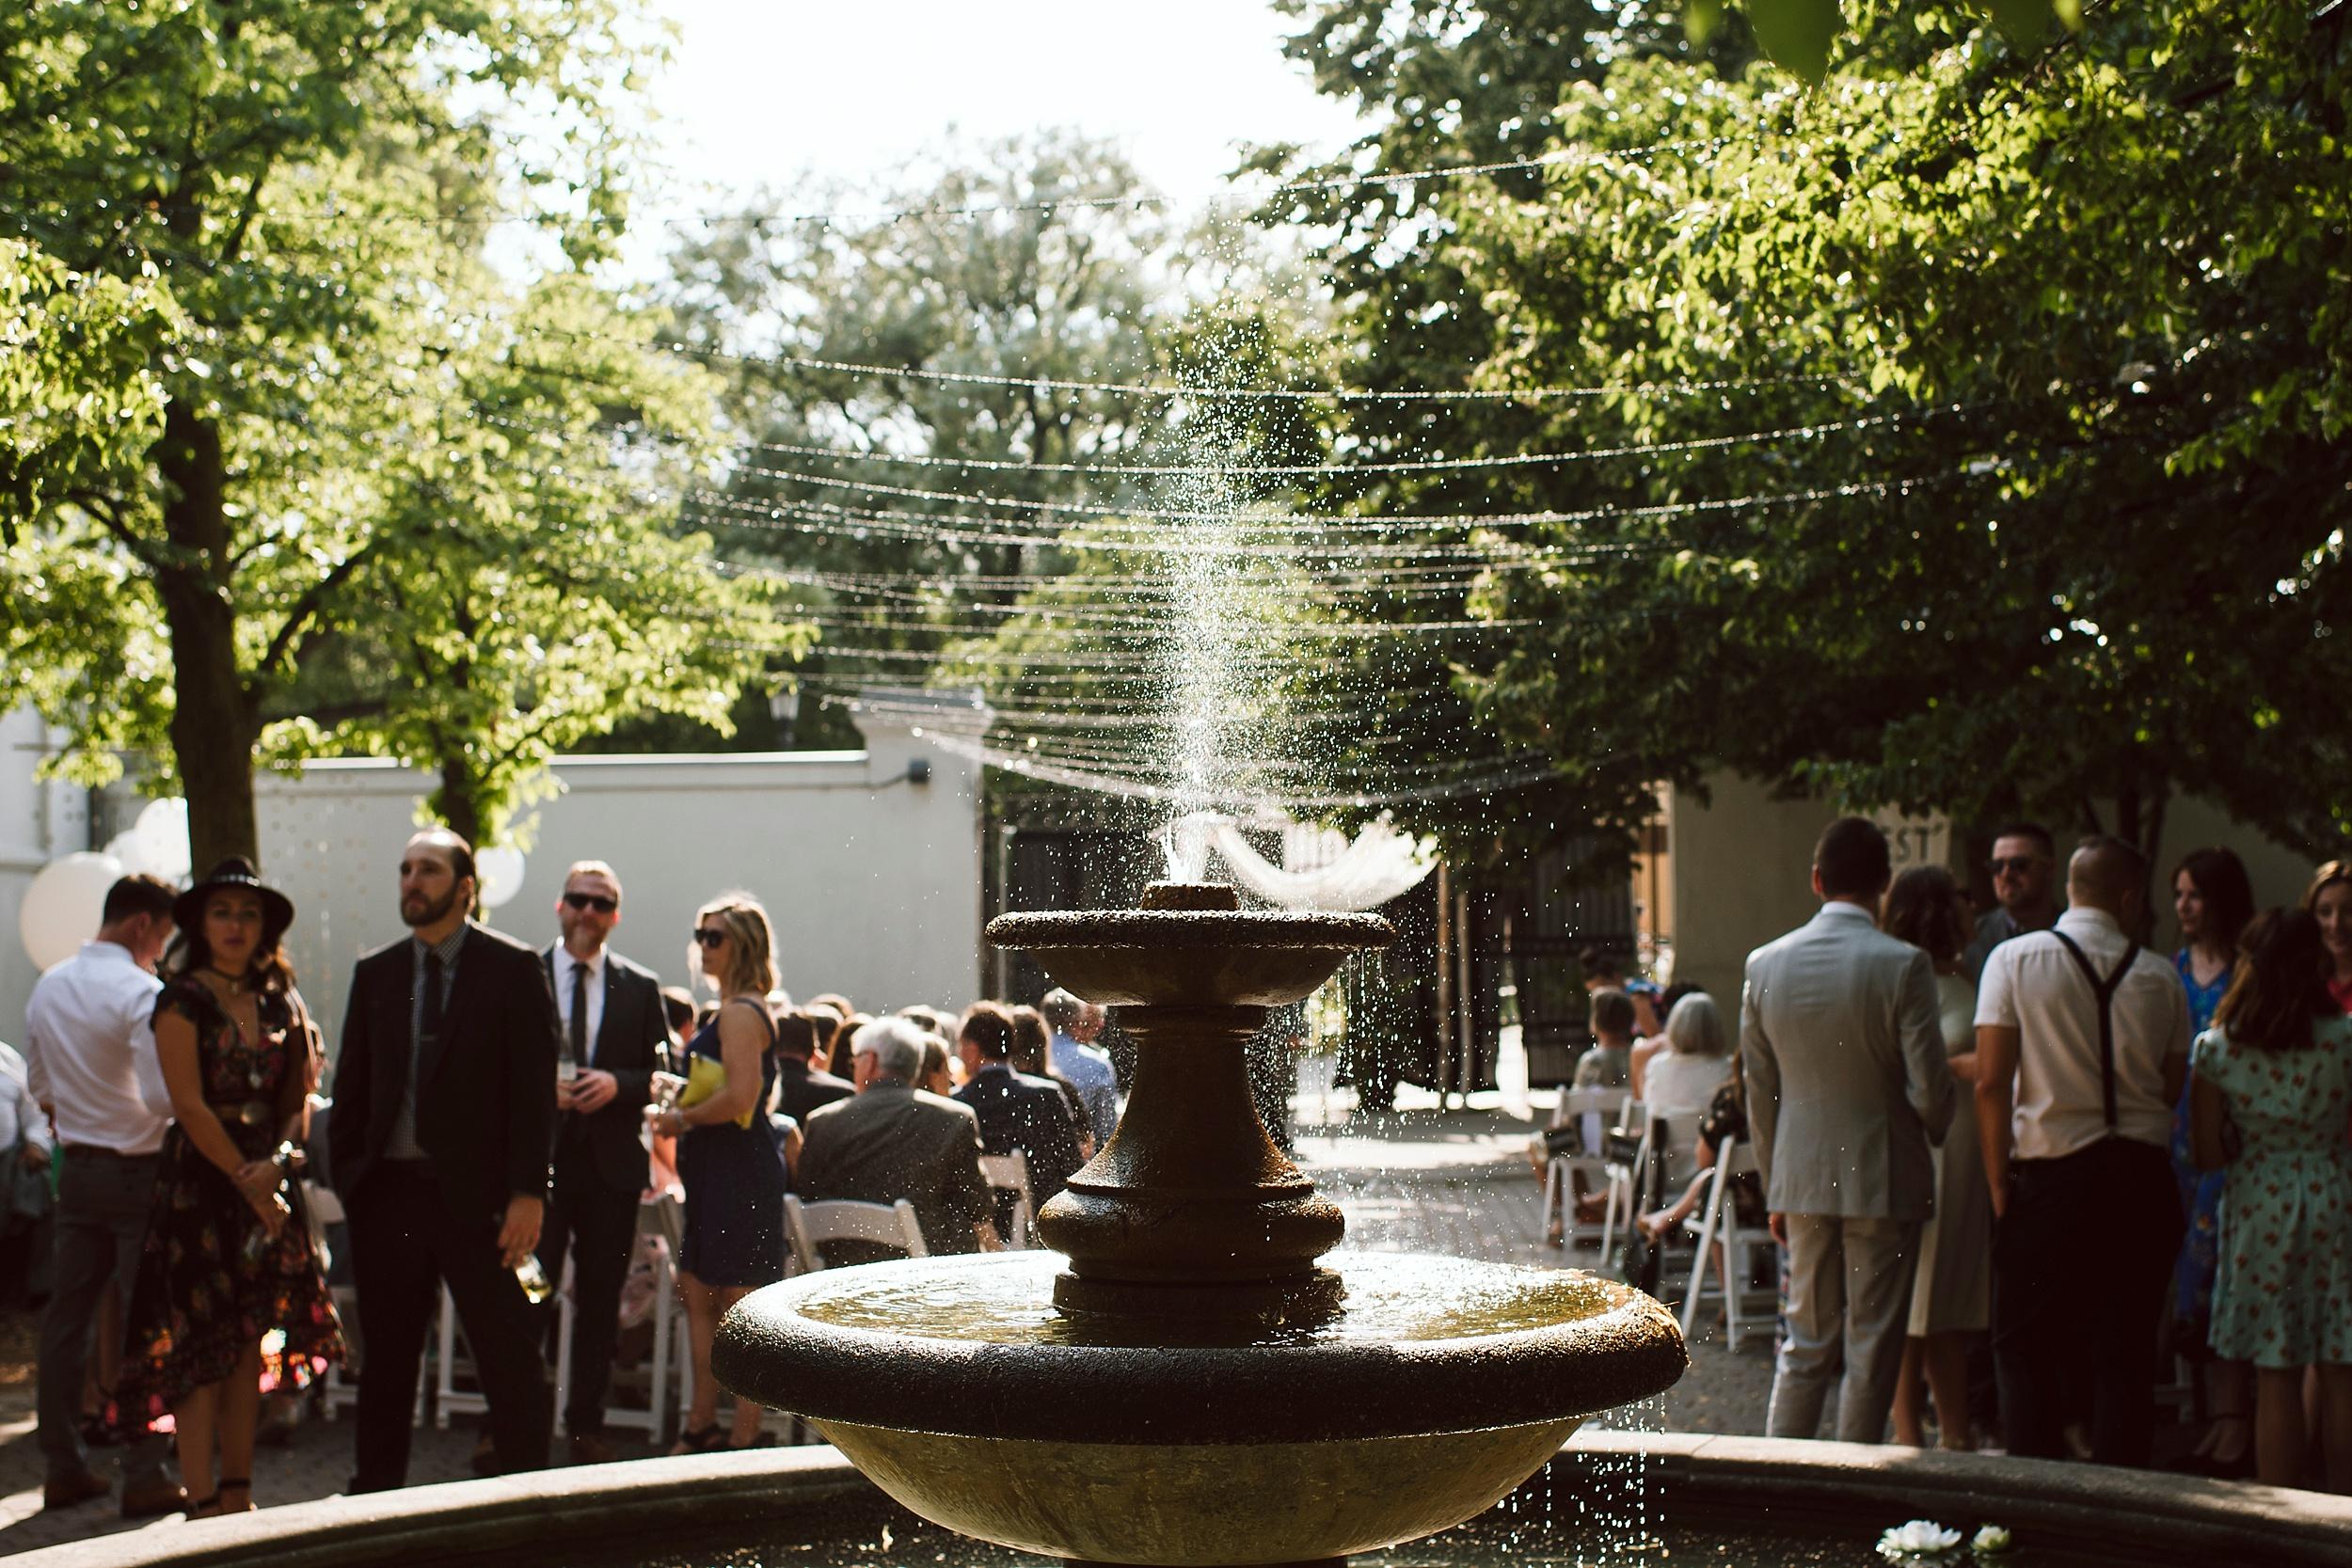 Sunnyside_Pavilion_Wedding_Toronto_Photographer_0037.jpg